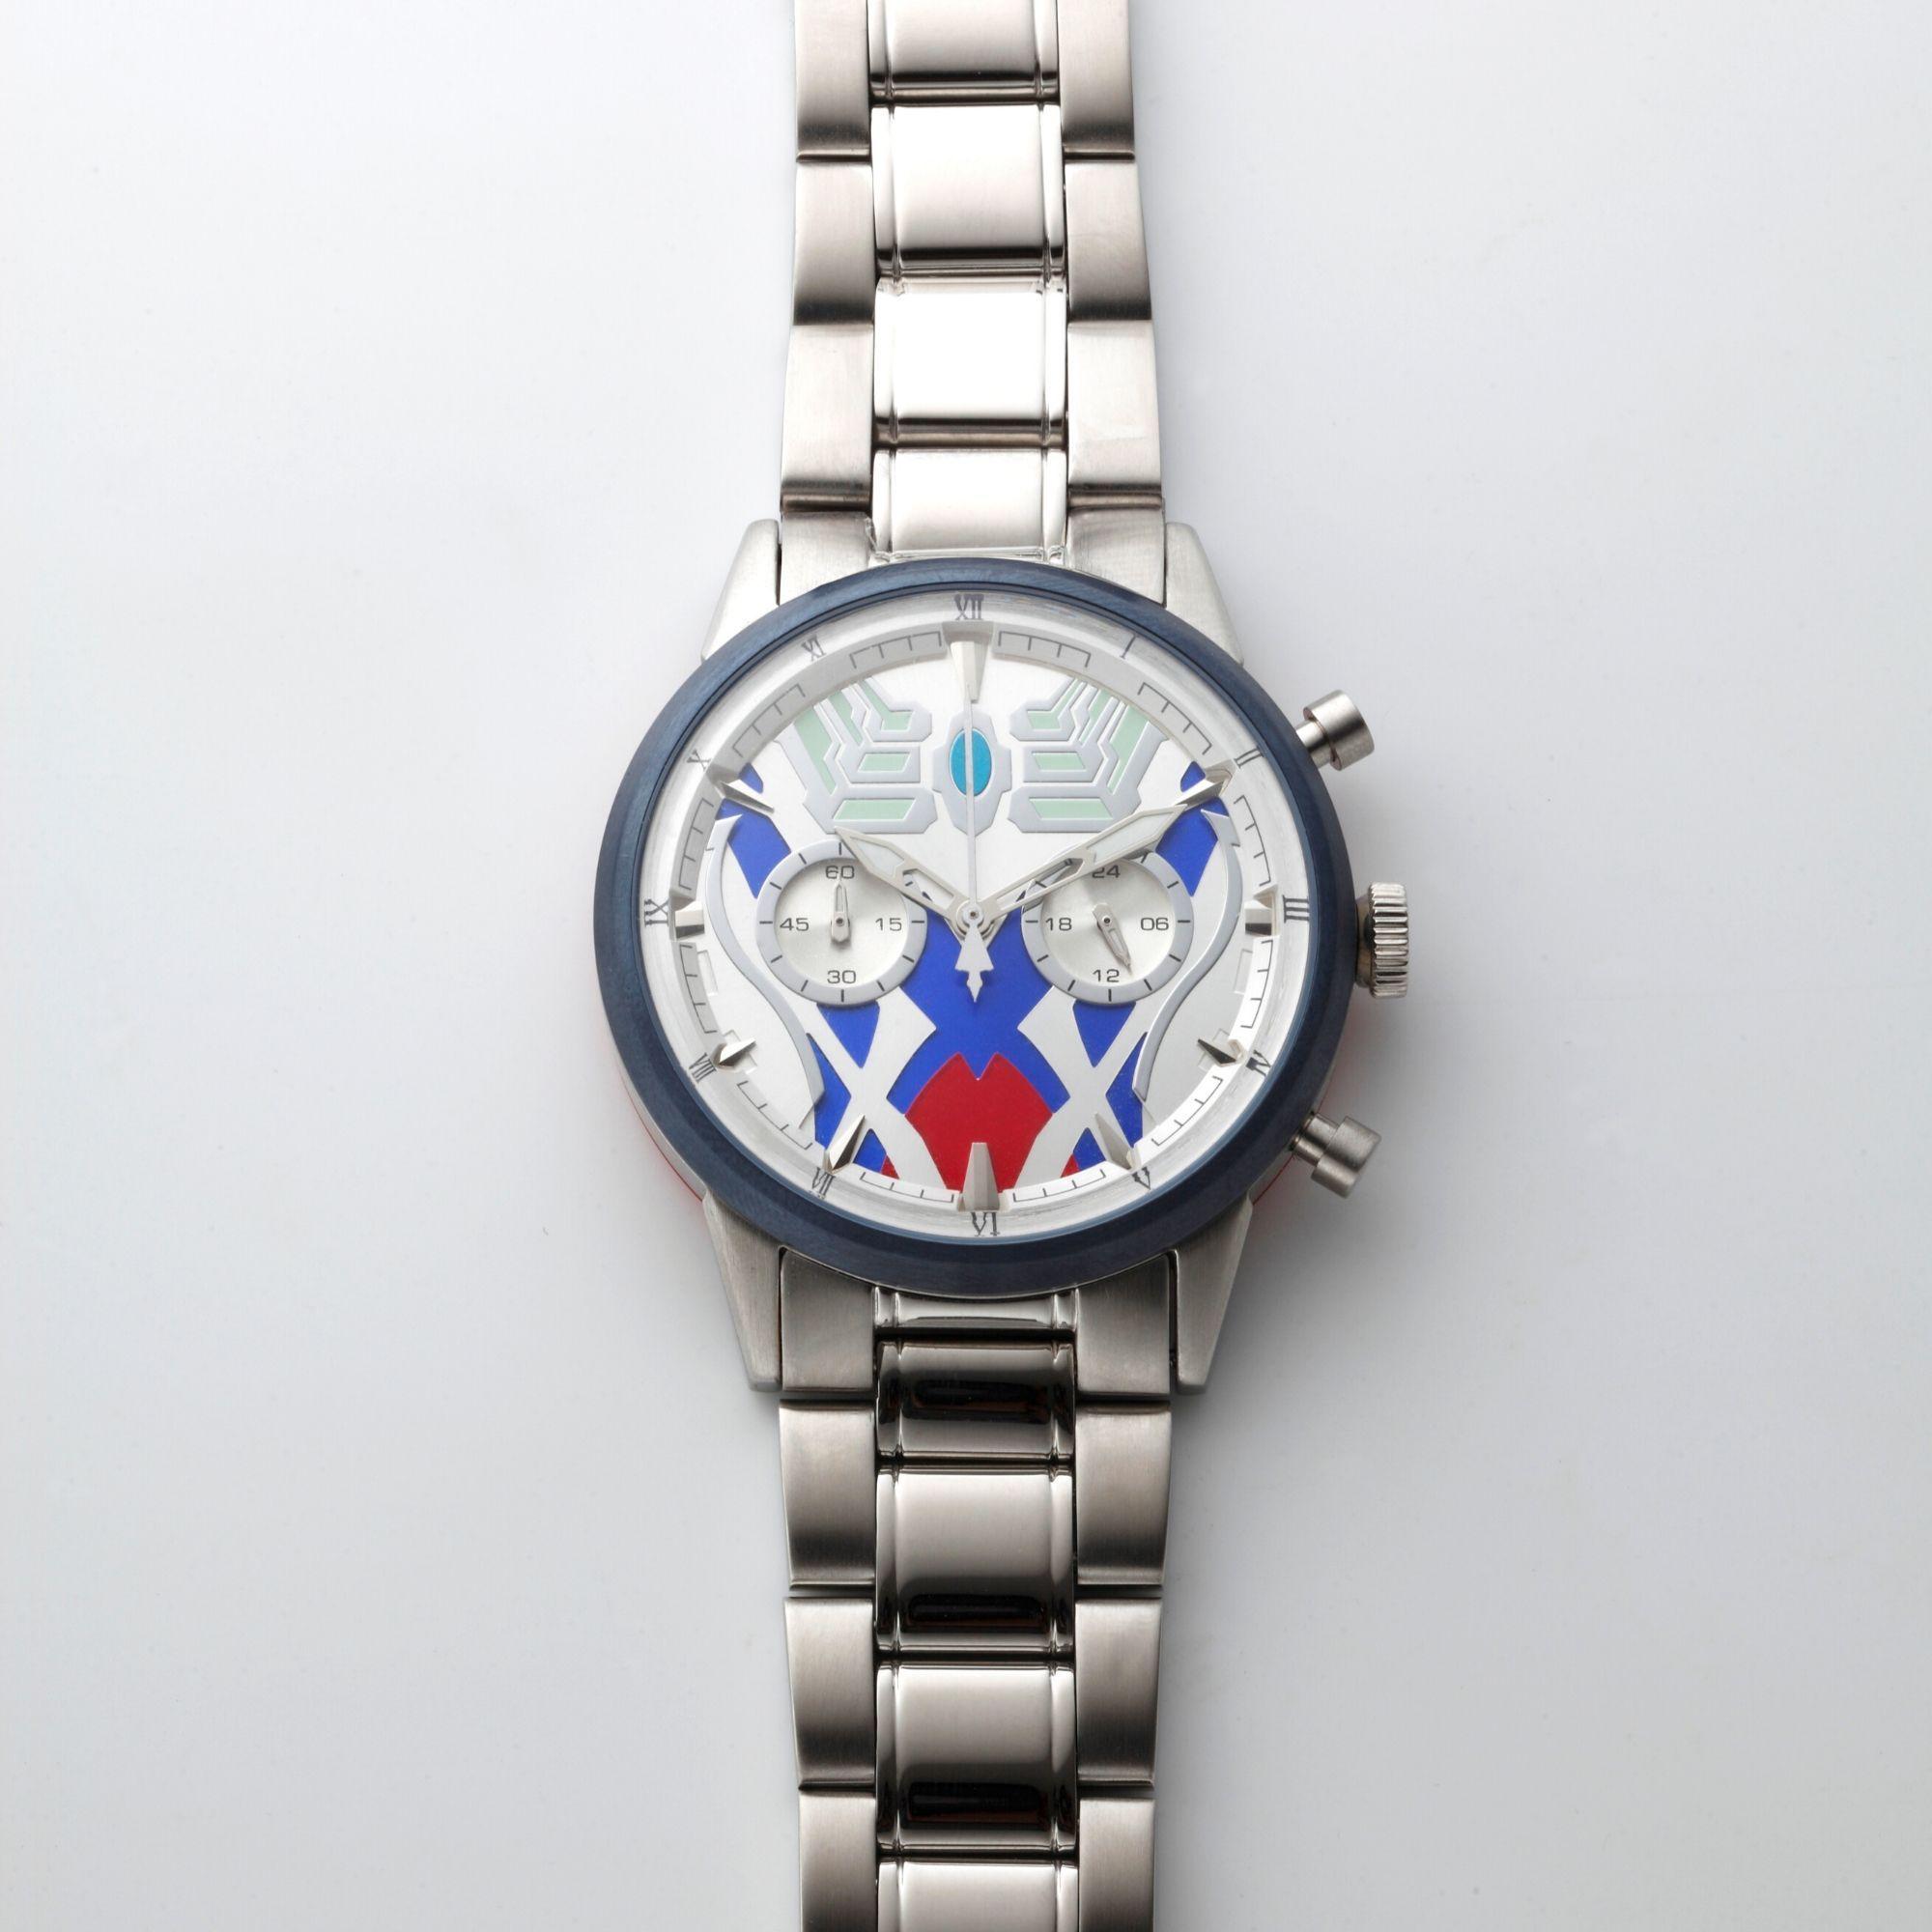 超人ZERO  10周年Anniversary紀念腕錶